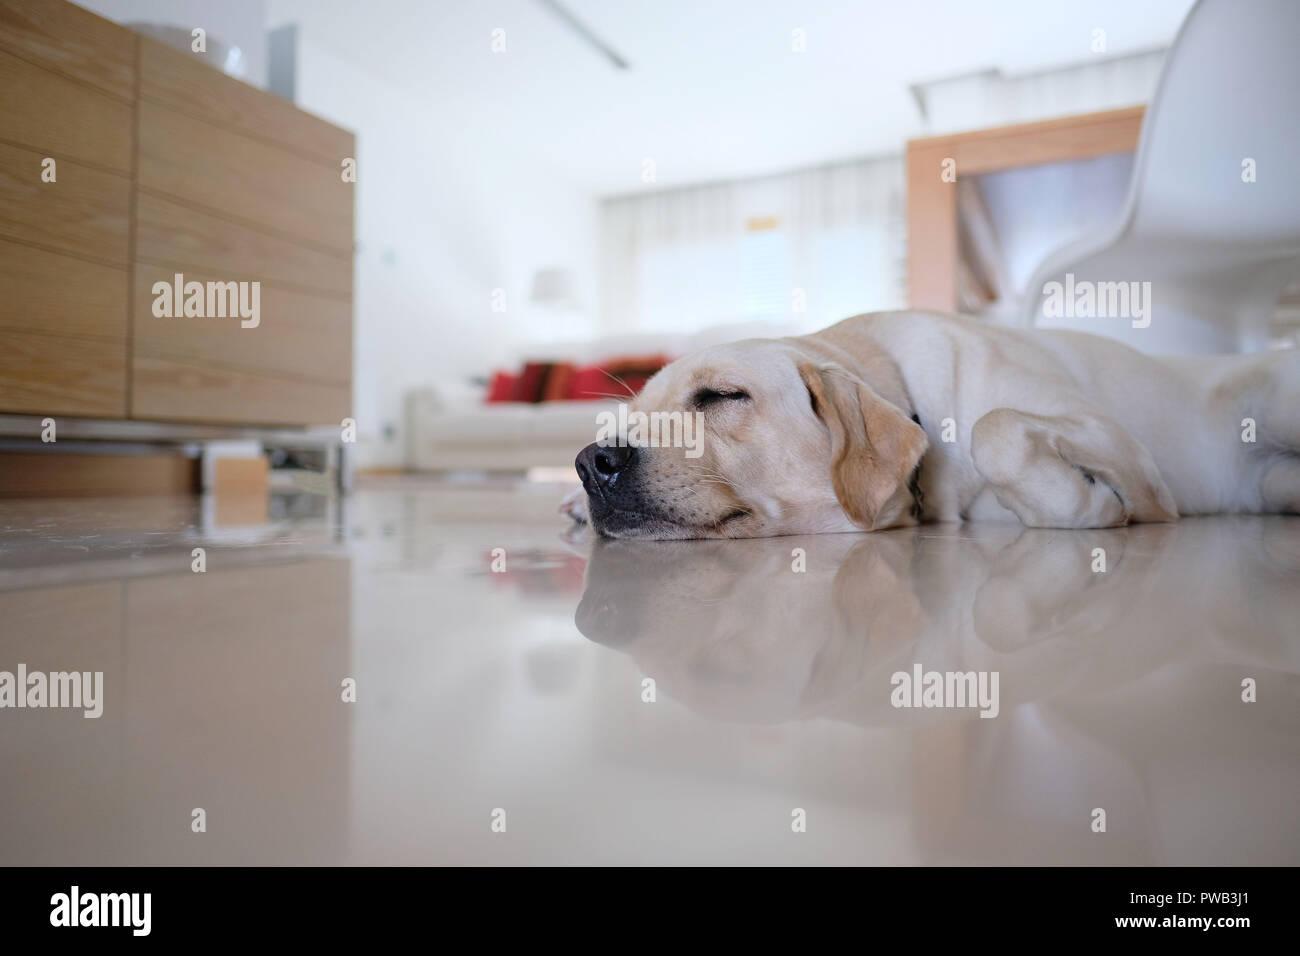 Yellow labrador retriever sleeping on the floor at home - Stock Image